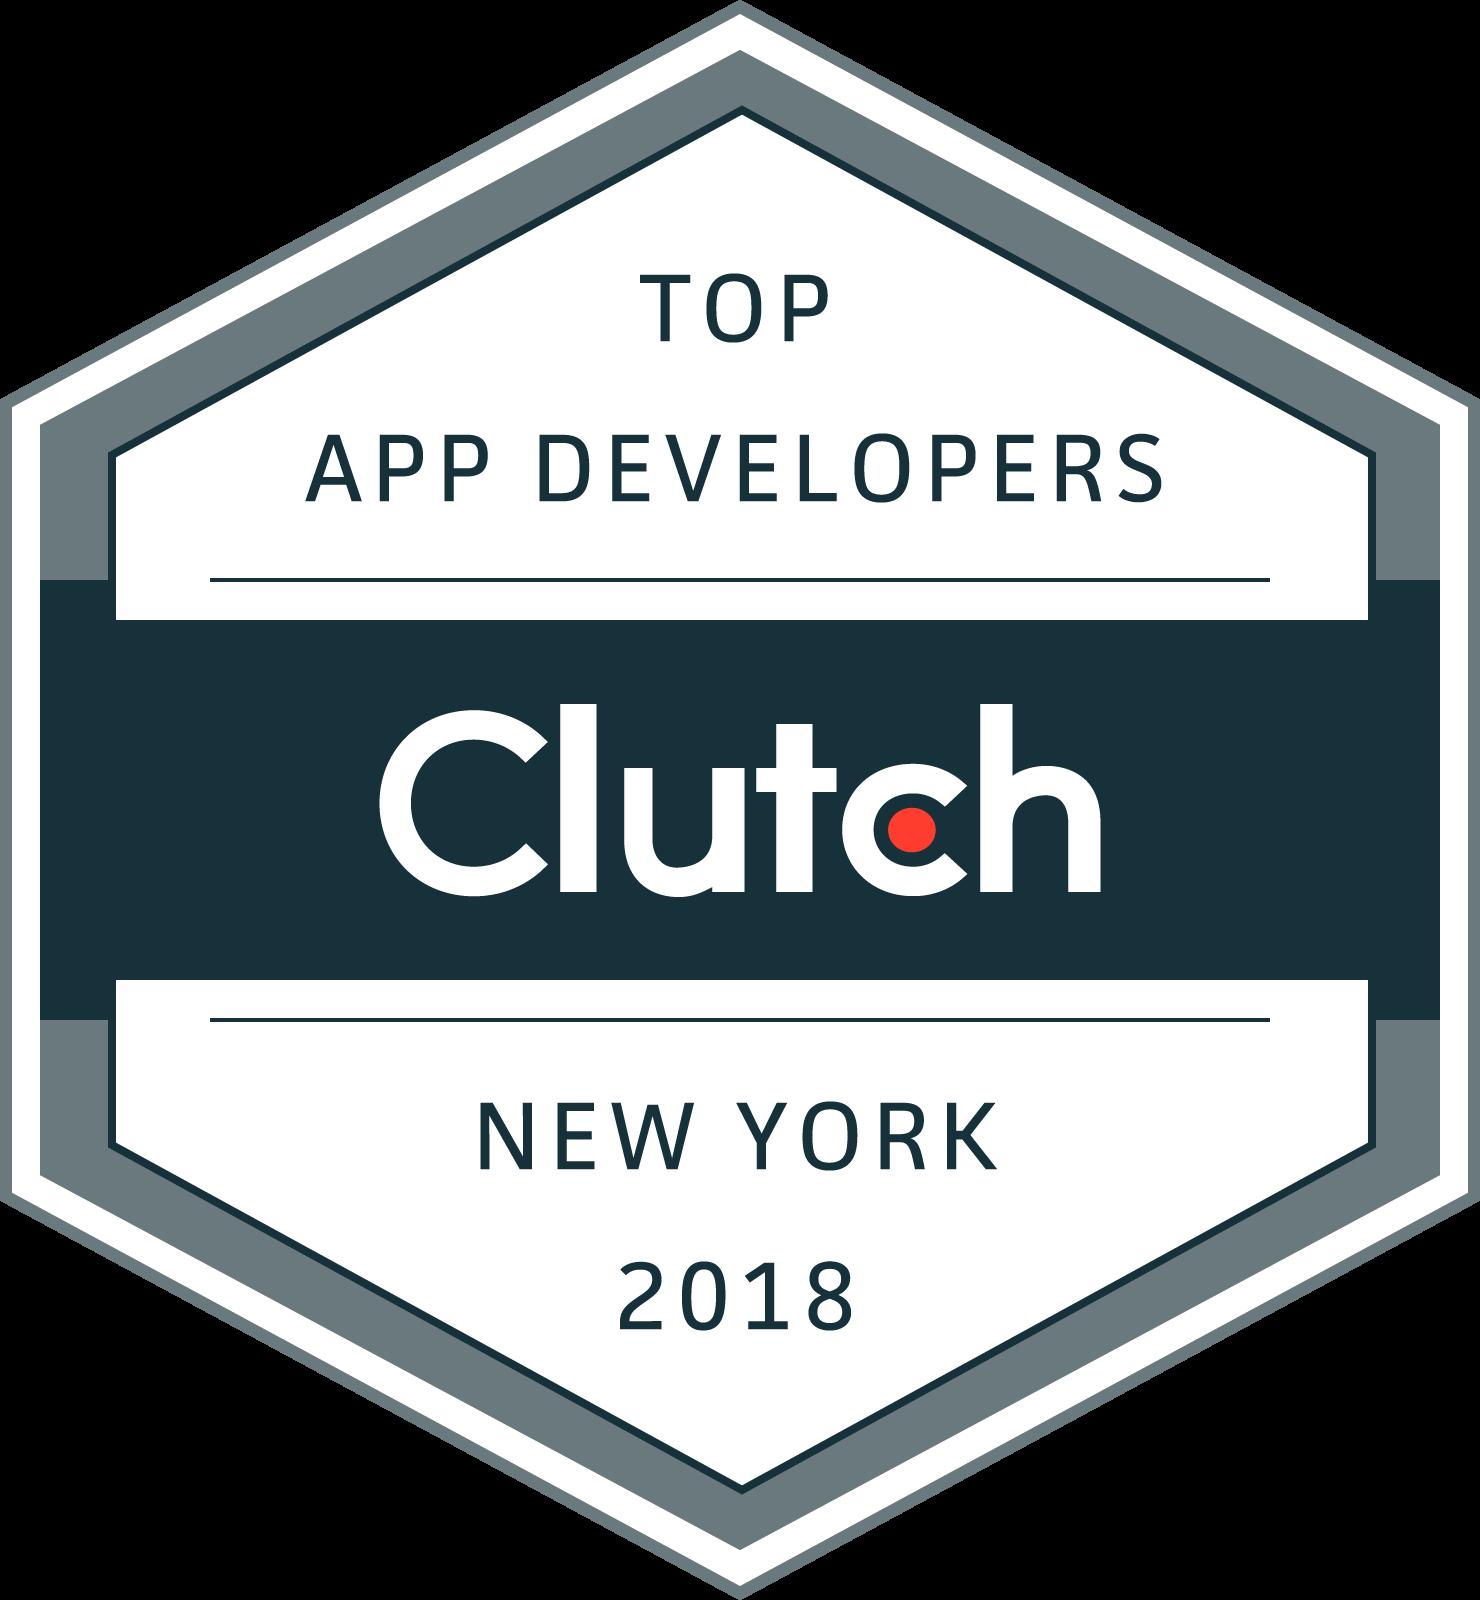 Top App Developers New York - Clutch.co